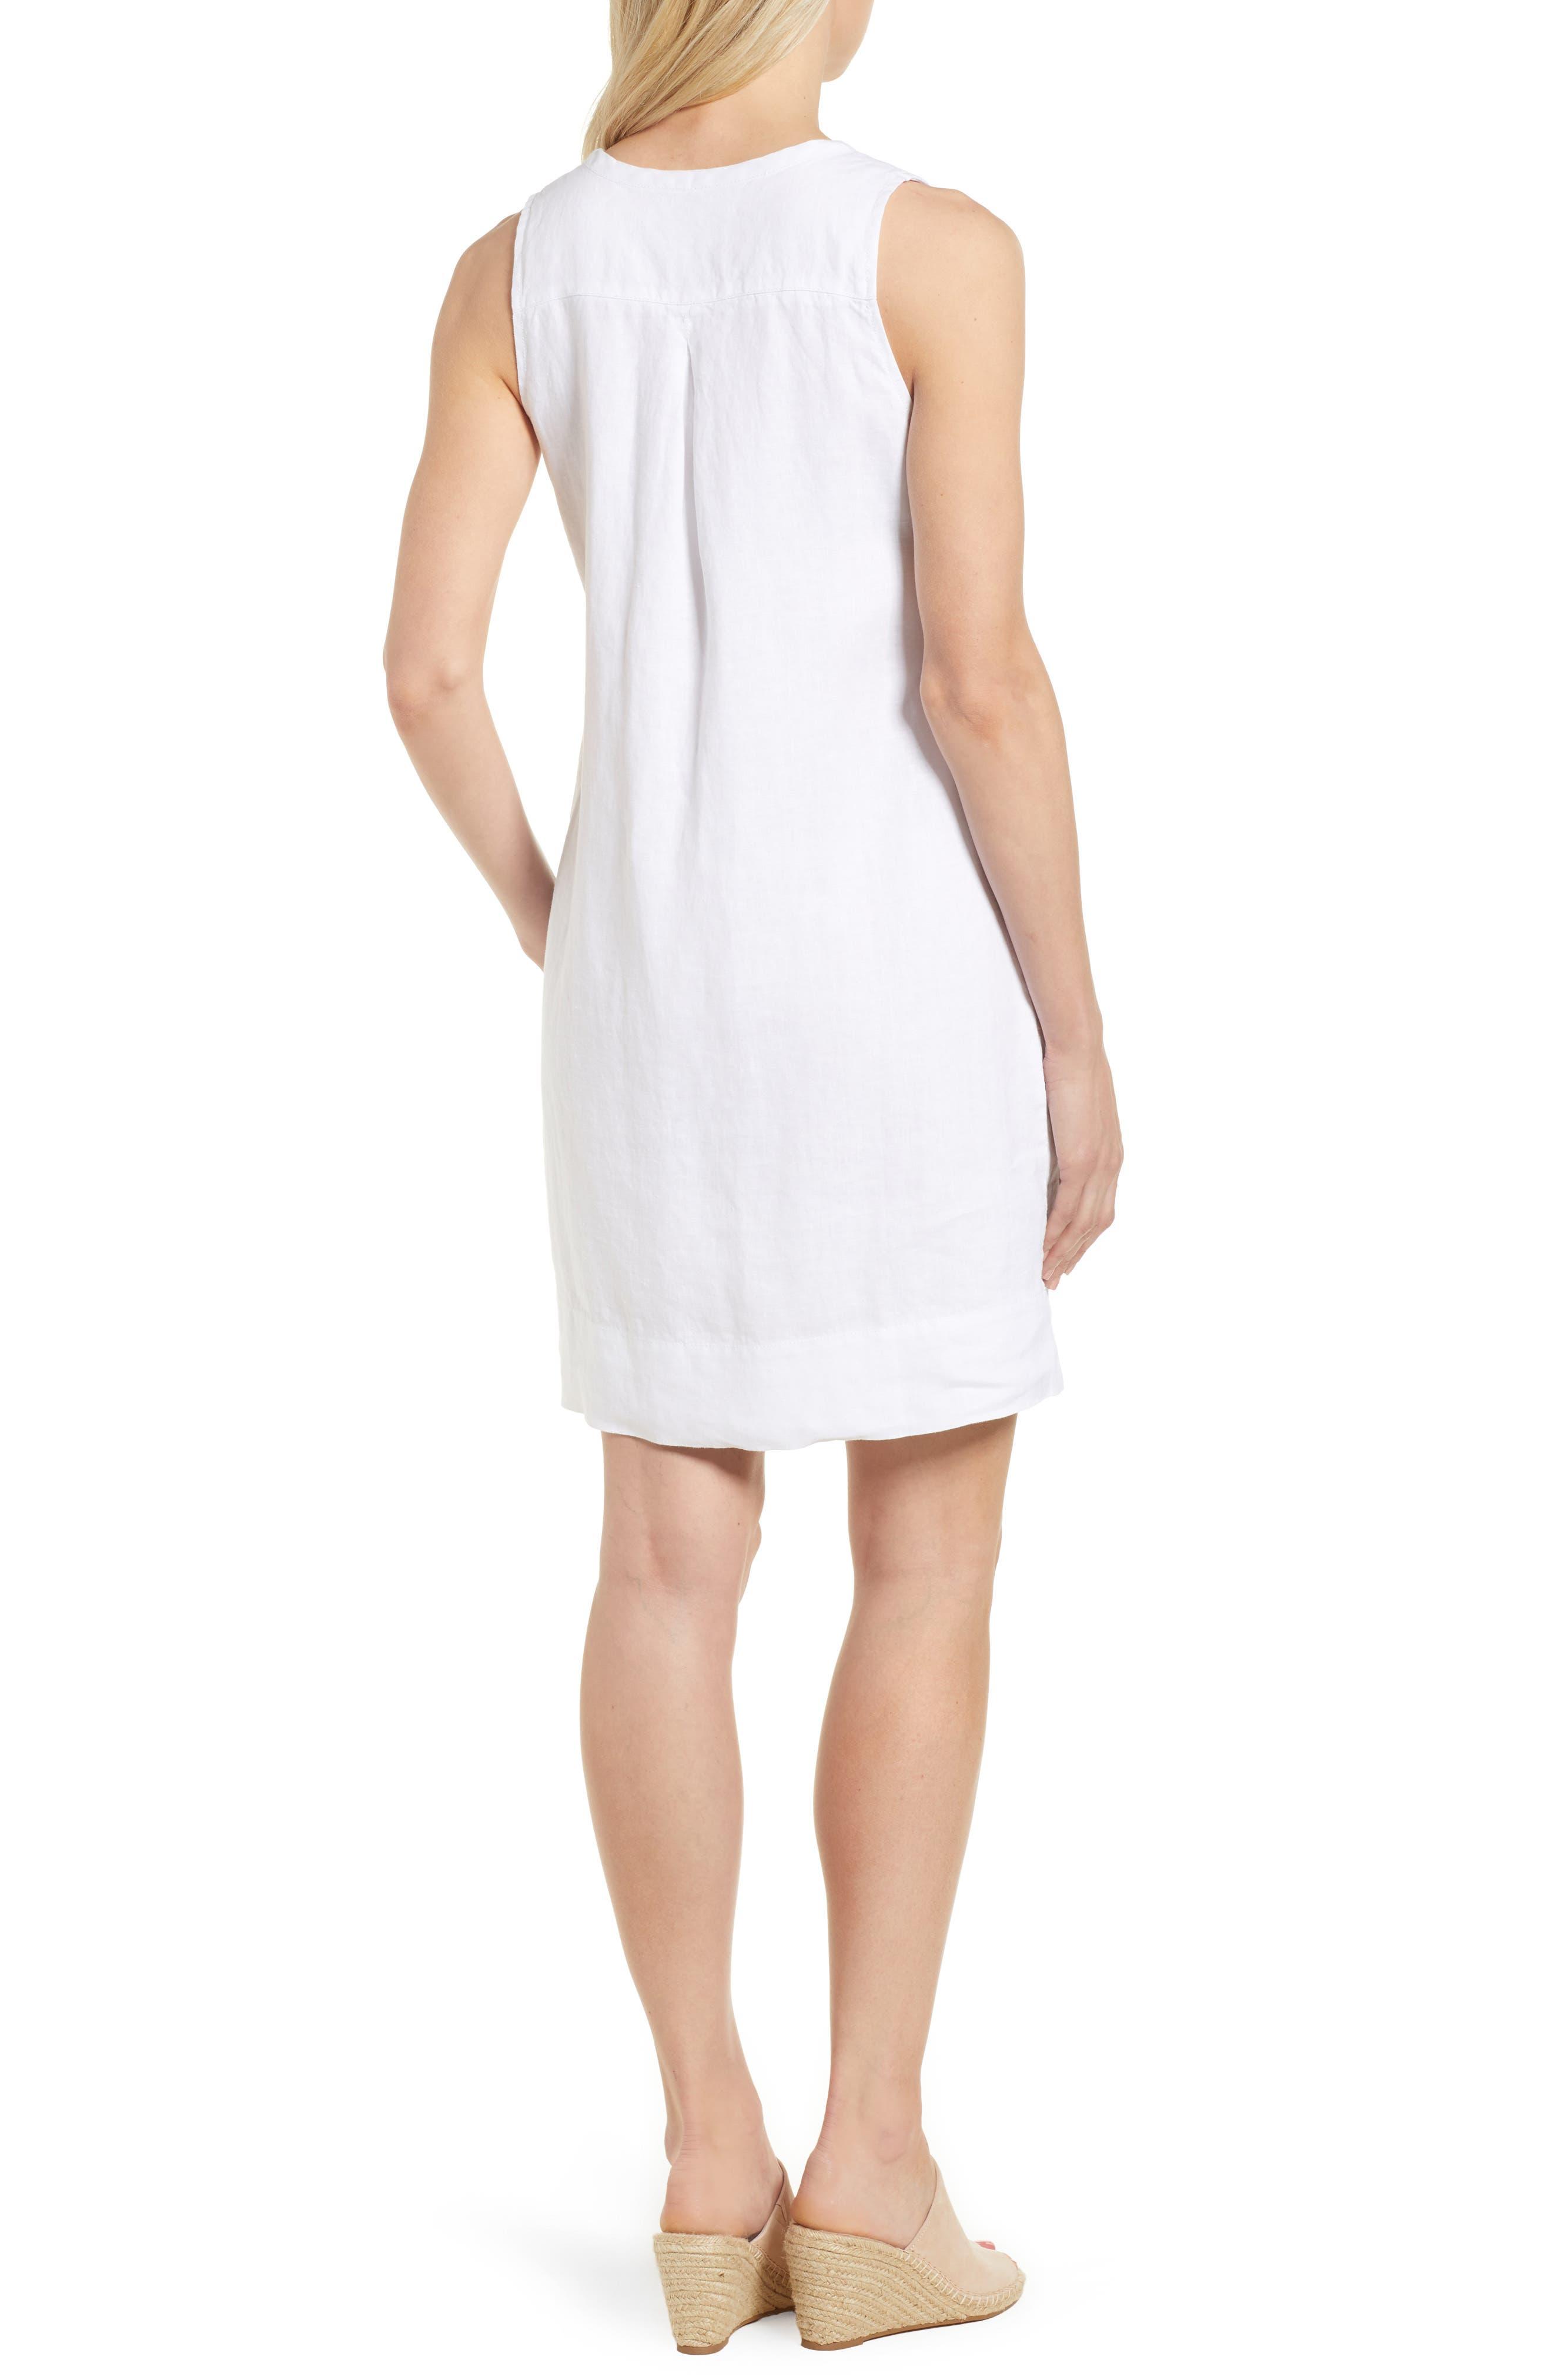 TOMMY BAHAMA, Sea Glass Linen Shift Dress, Alternate thumbnail 2, color, WHITE